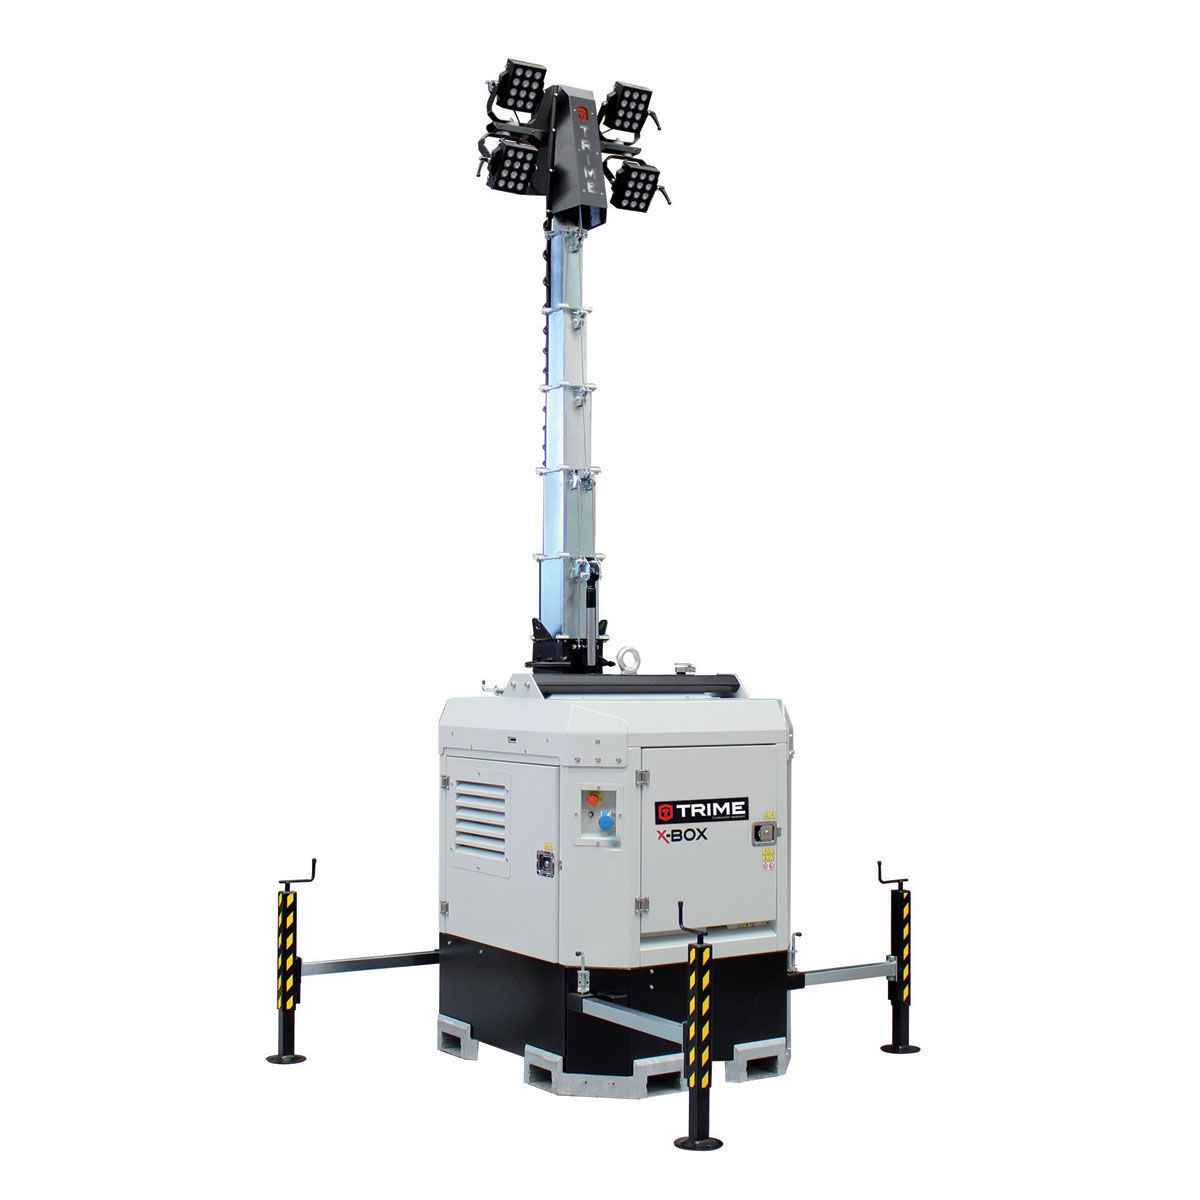 prozektoru-masts-led-x-box-4x150W-48V-atverta-pozicija